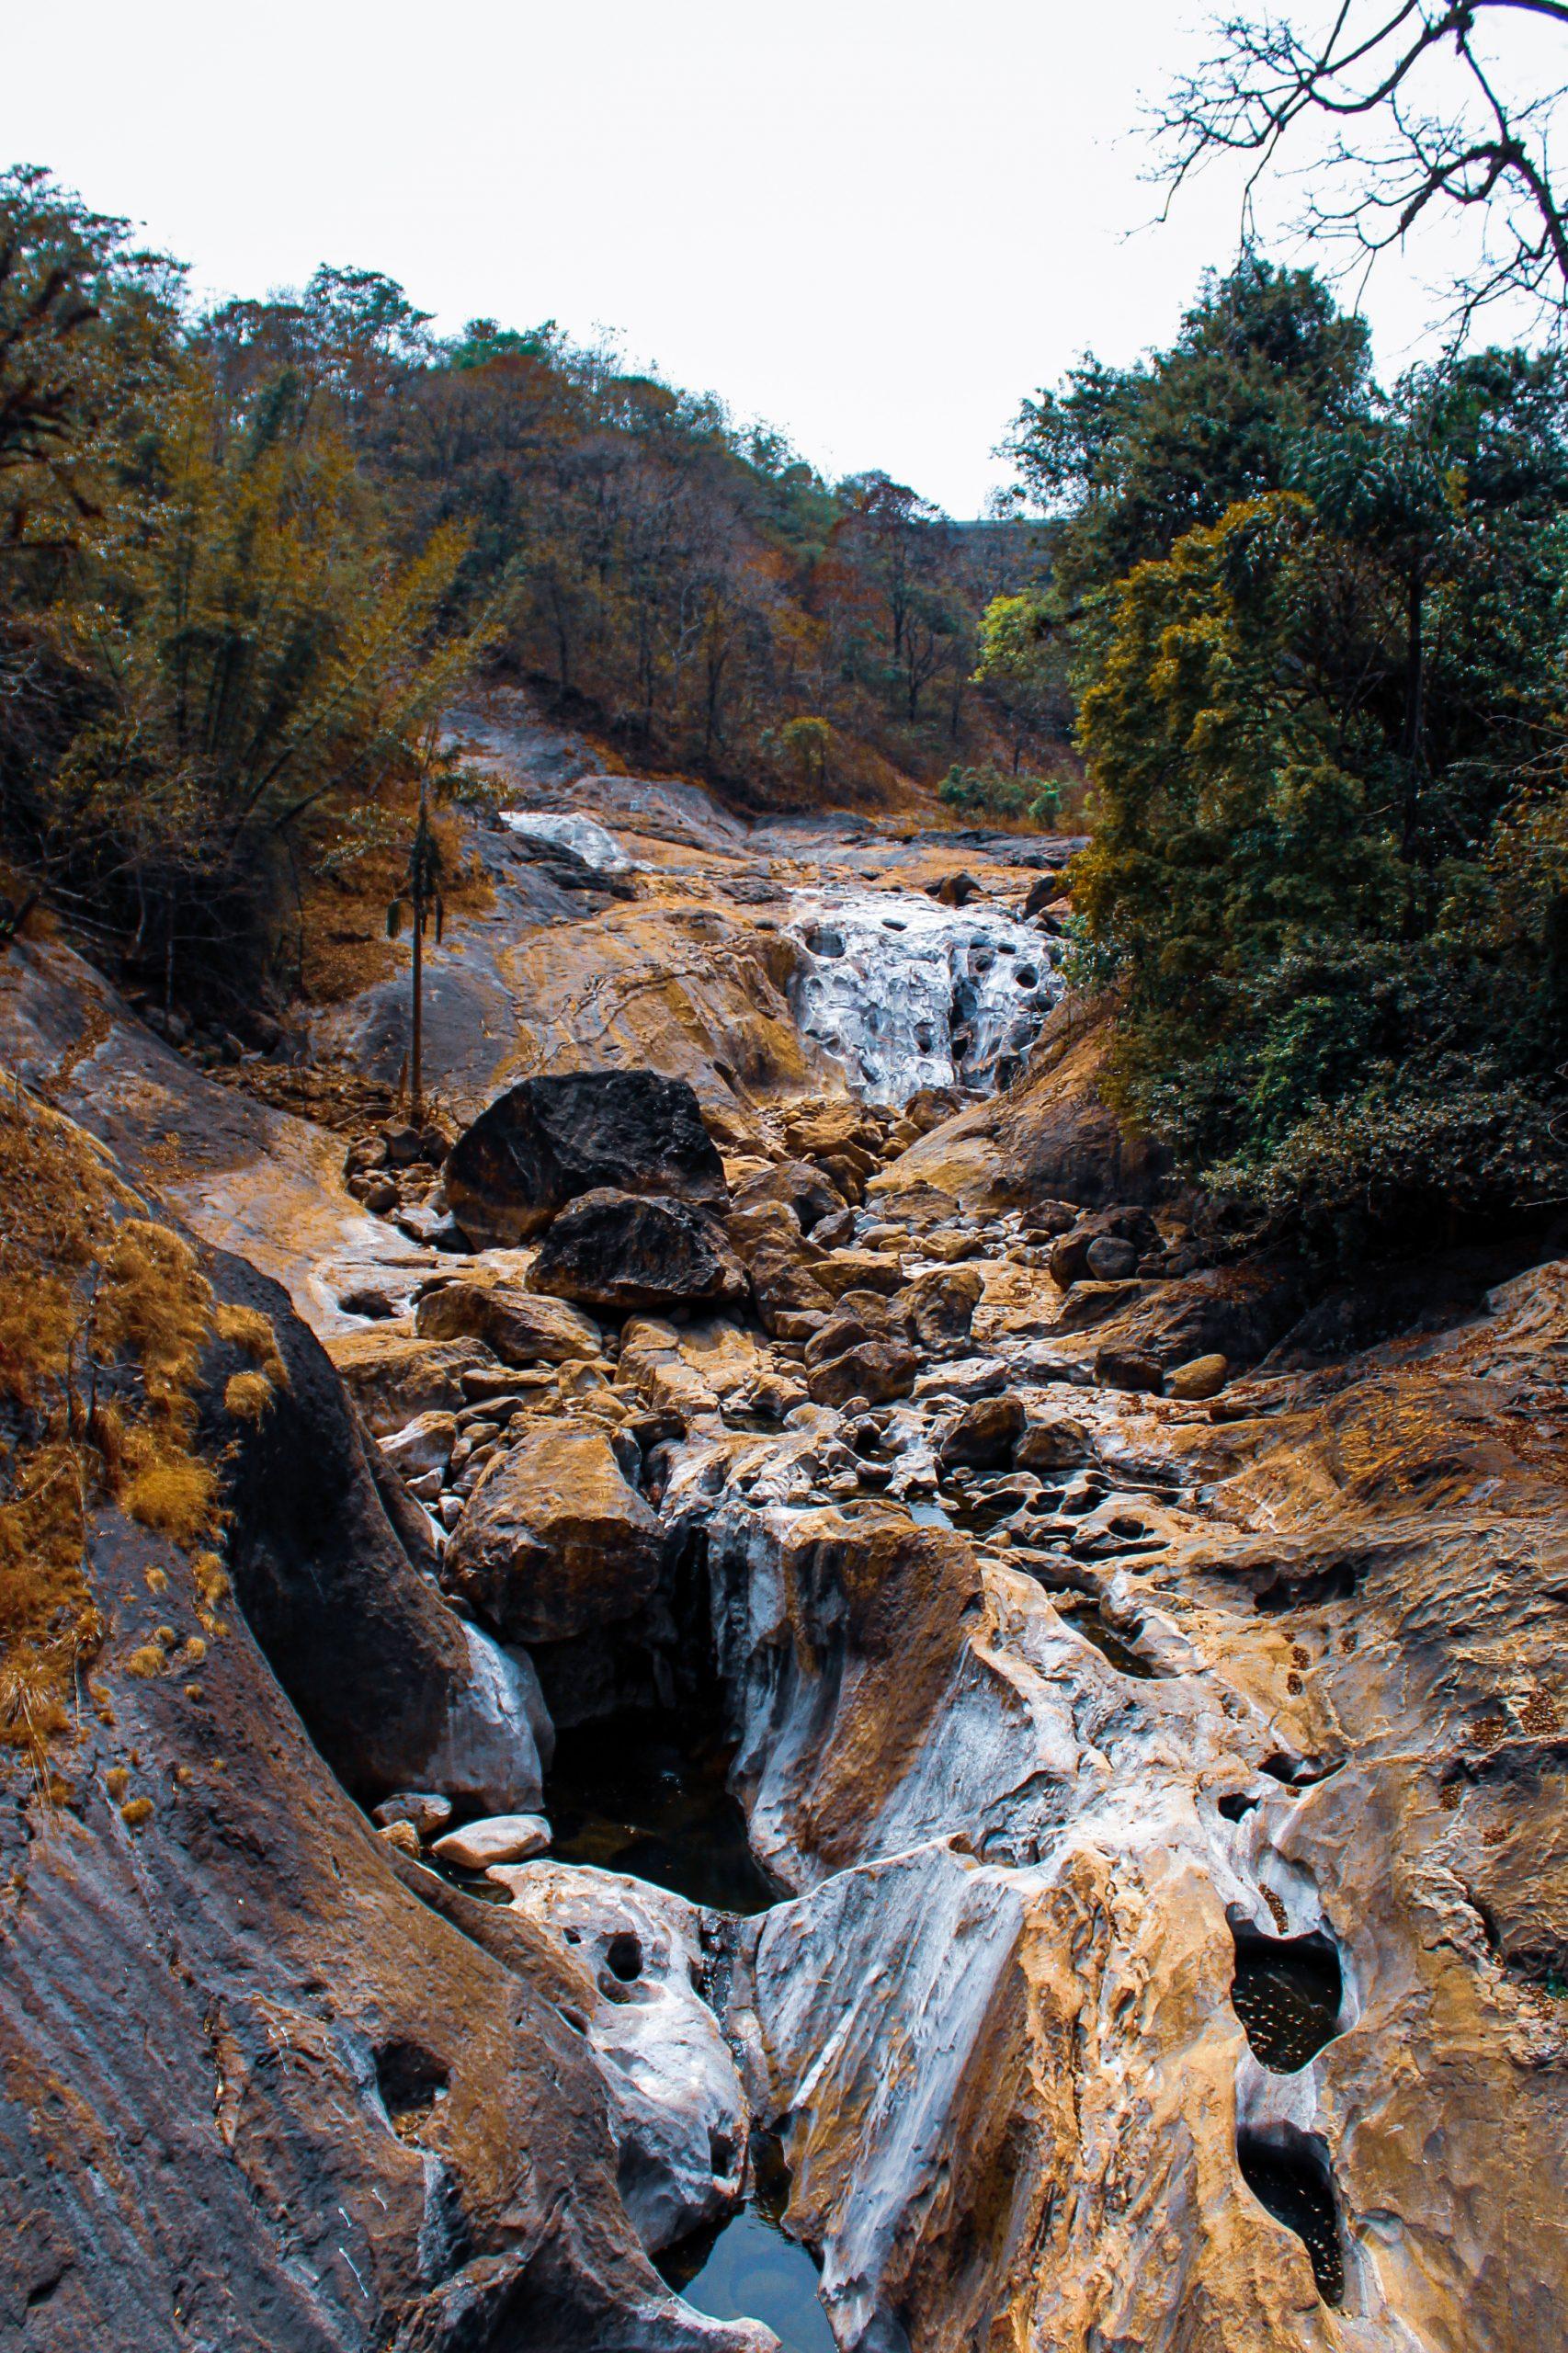 A dry river in a jungle